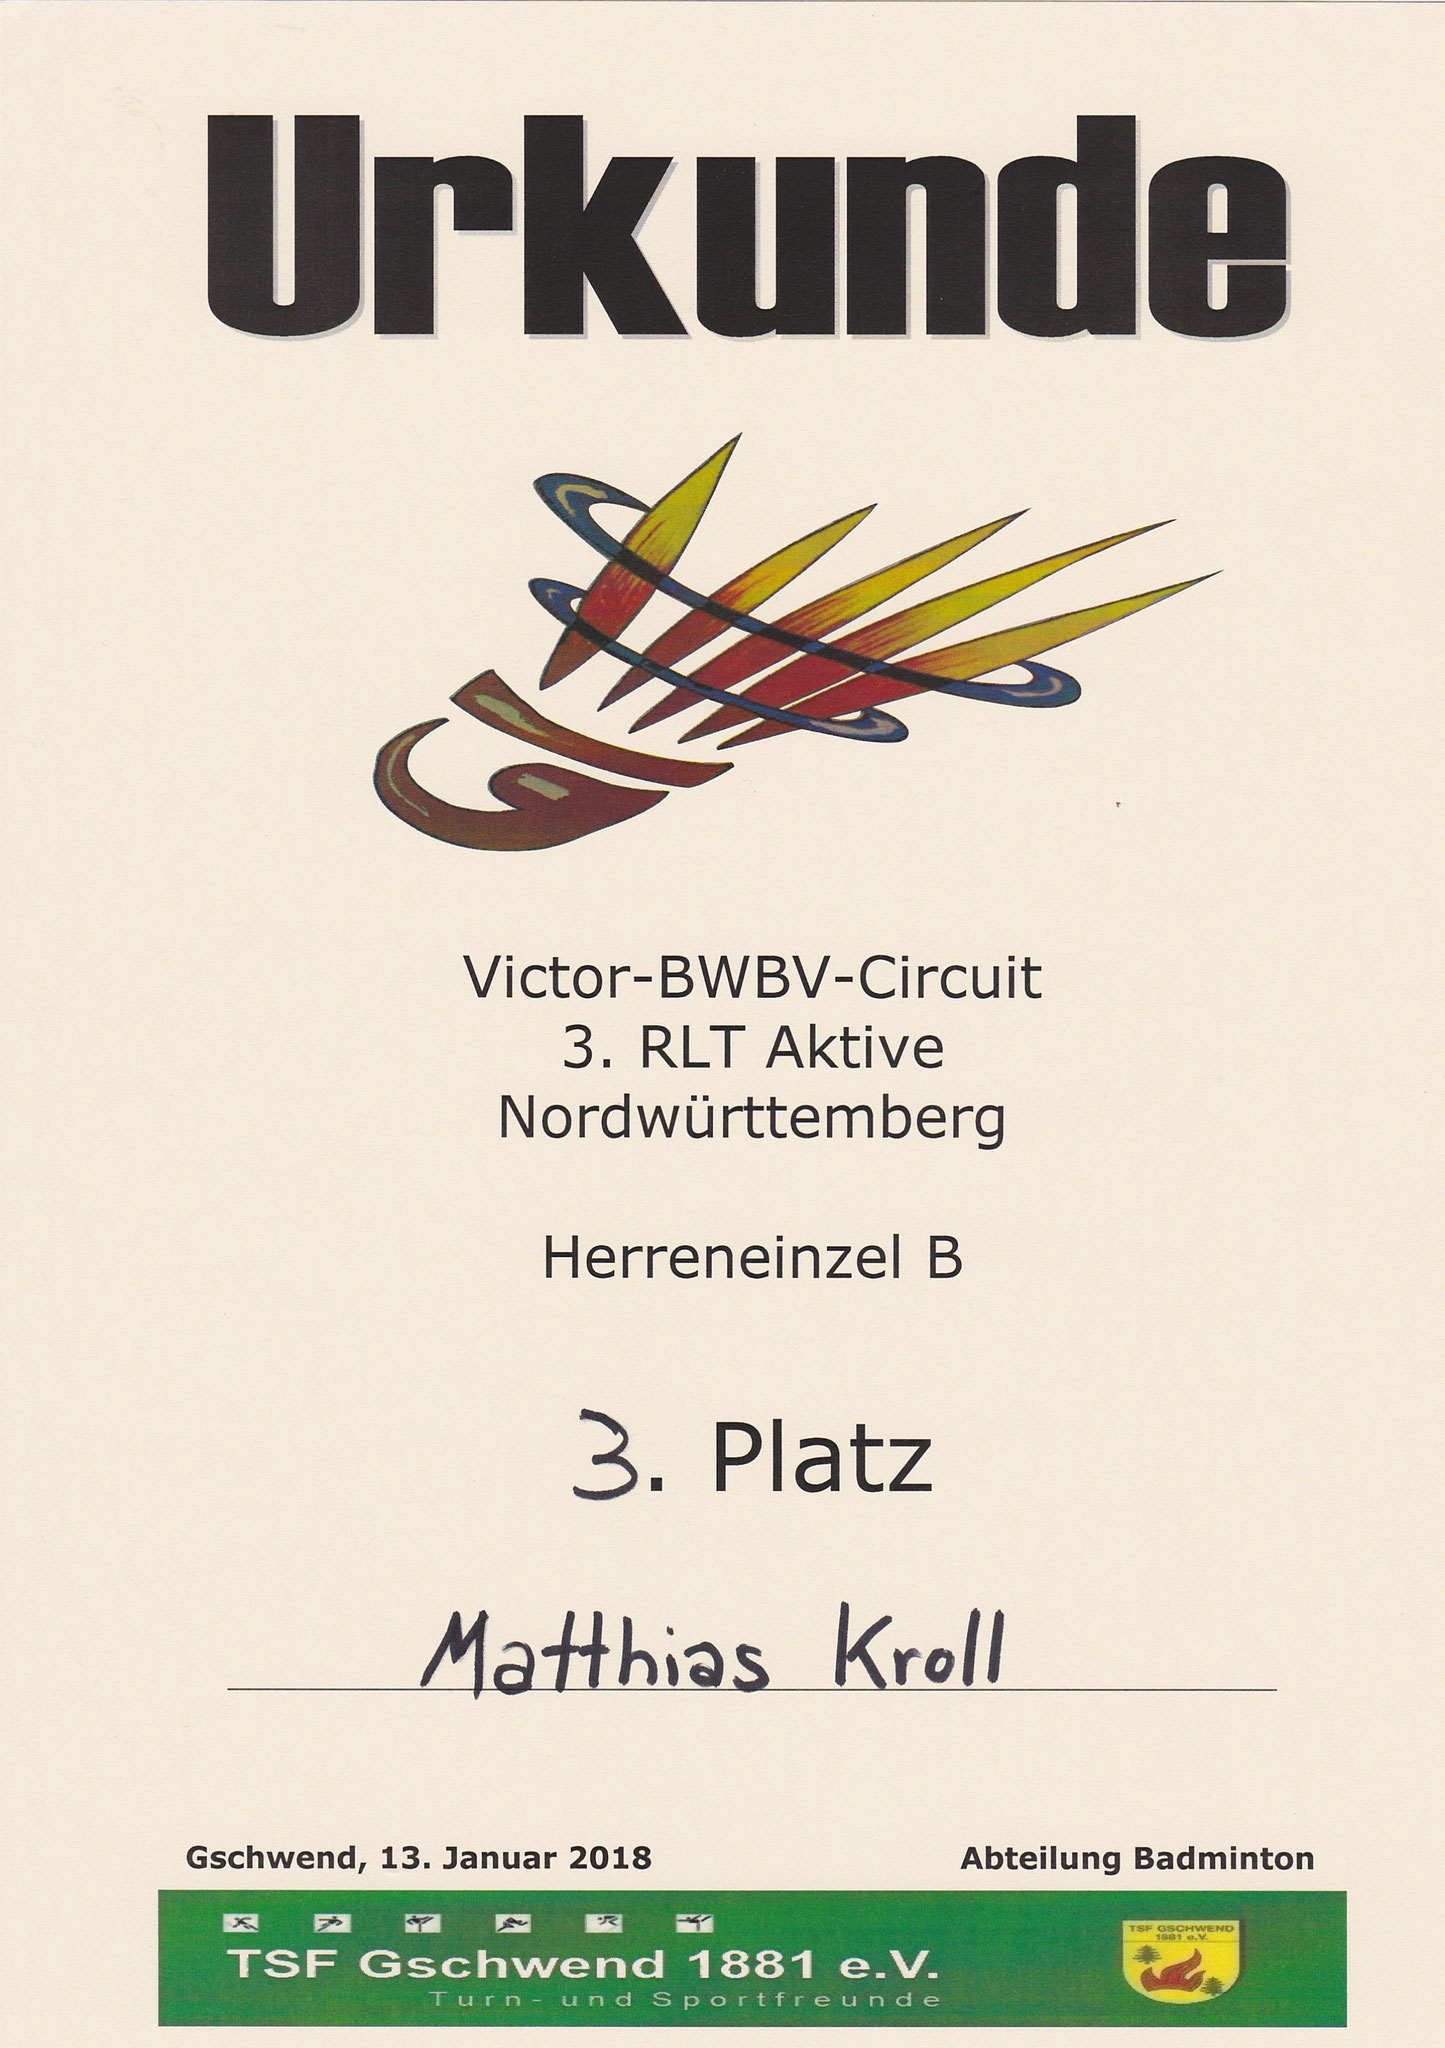 Urkunde Herreneinzel 3. Platz